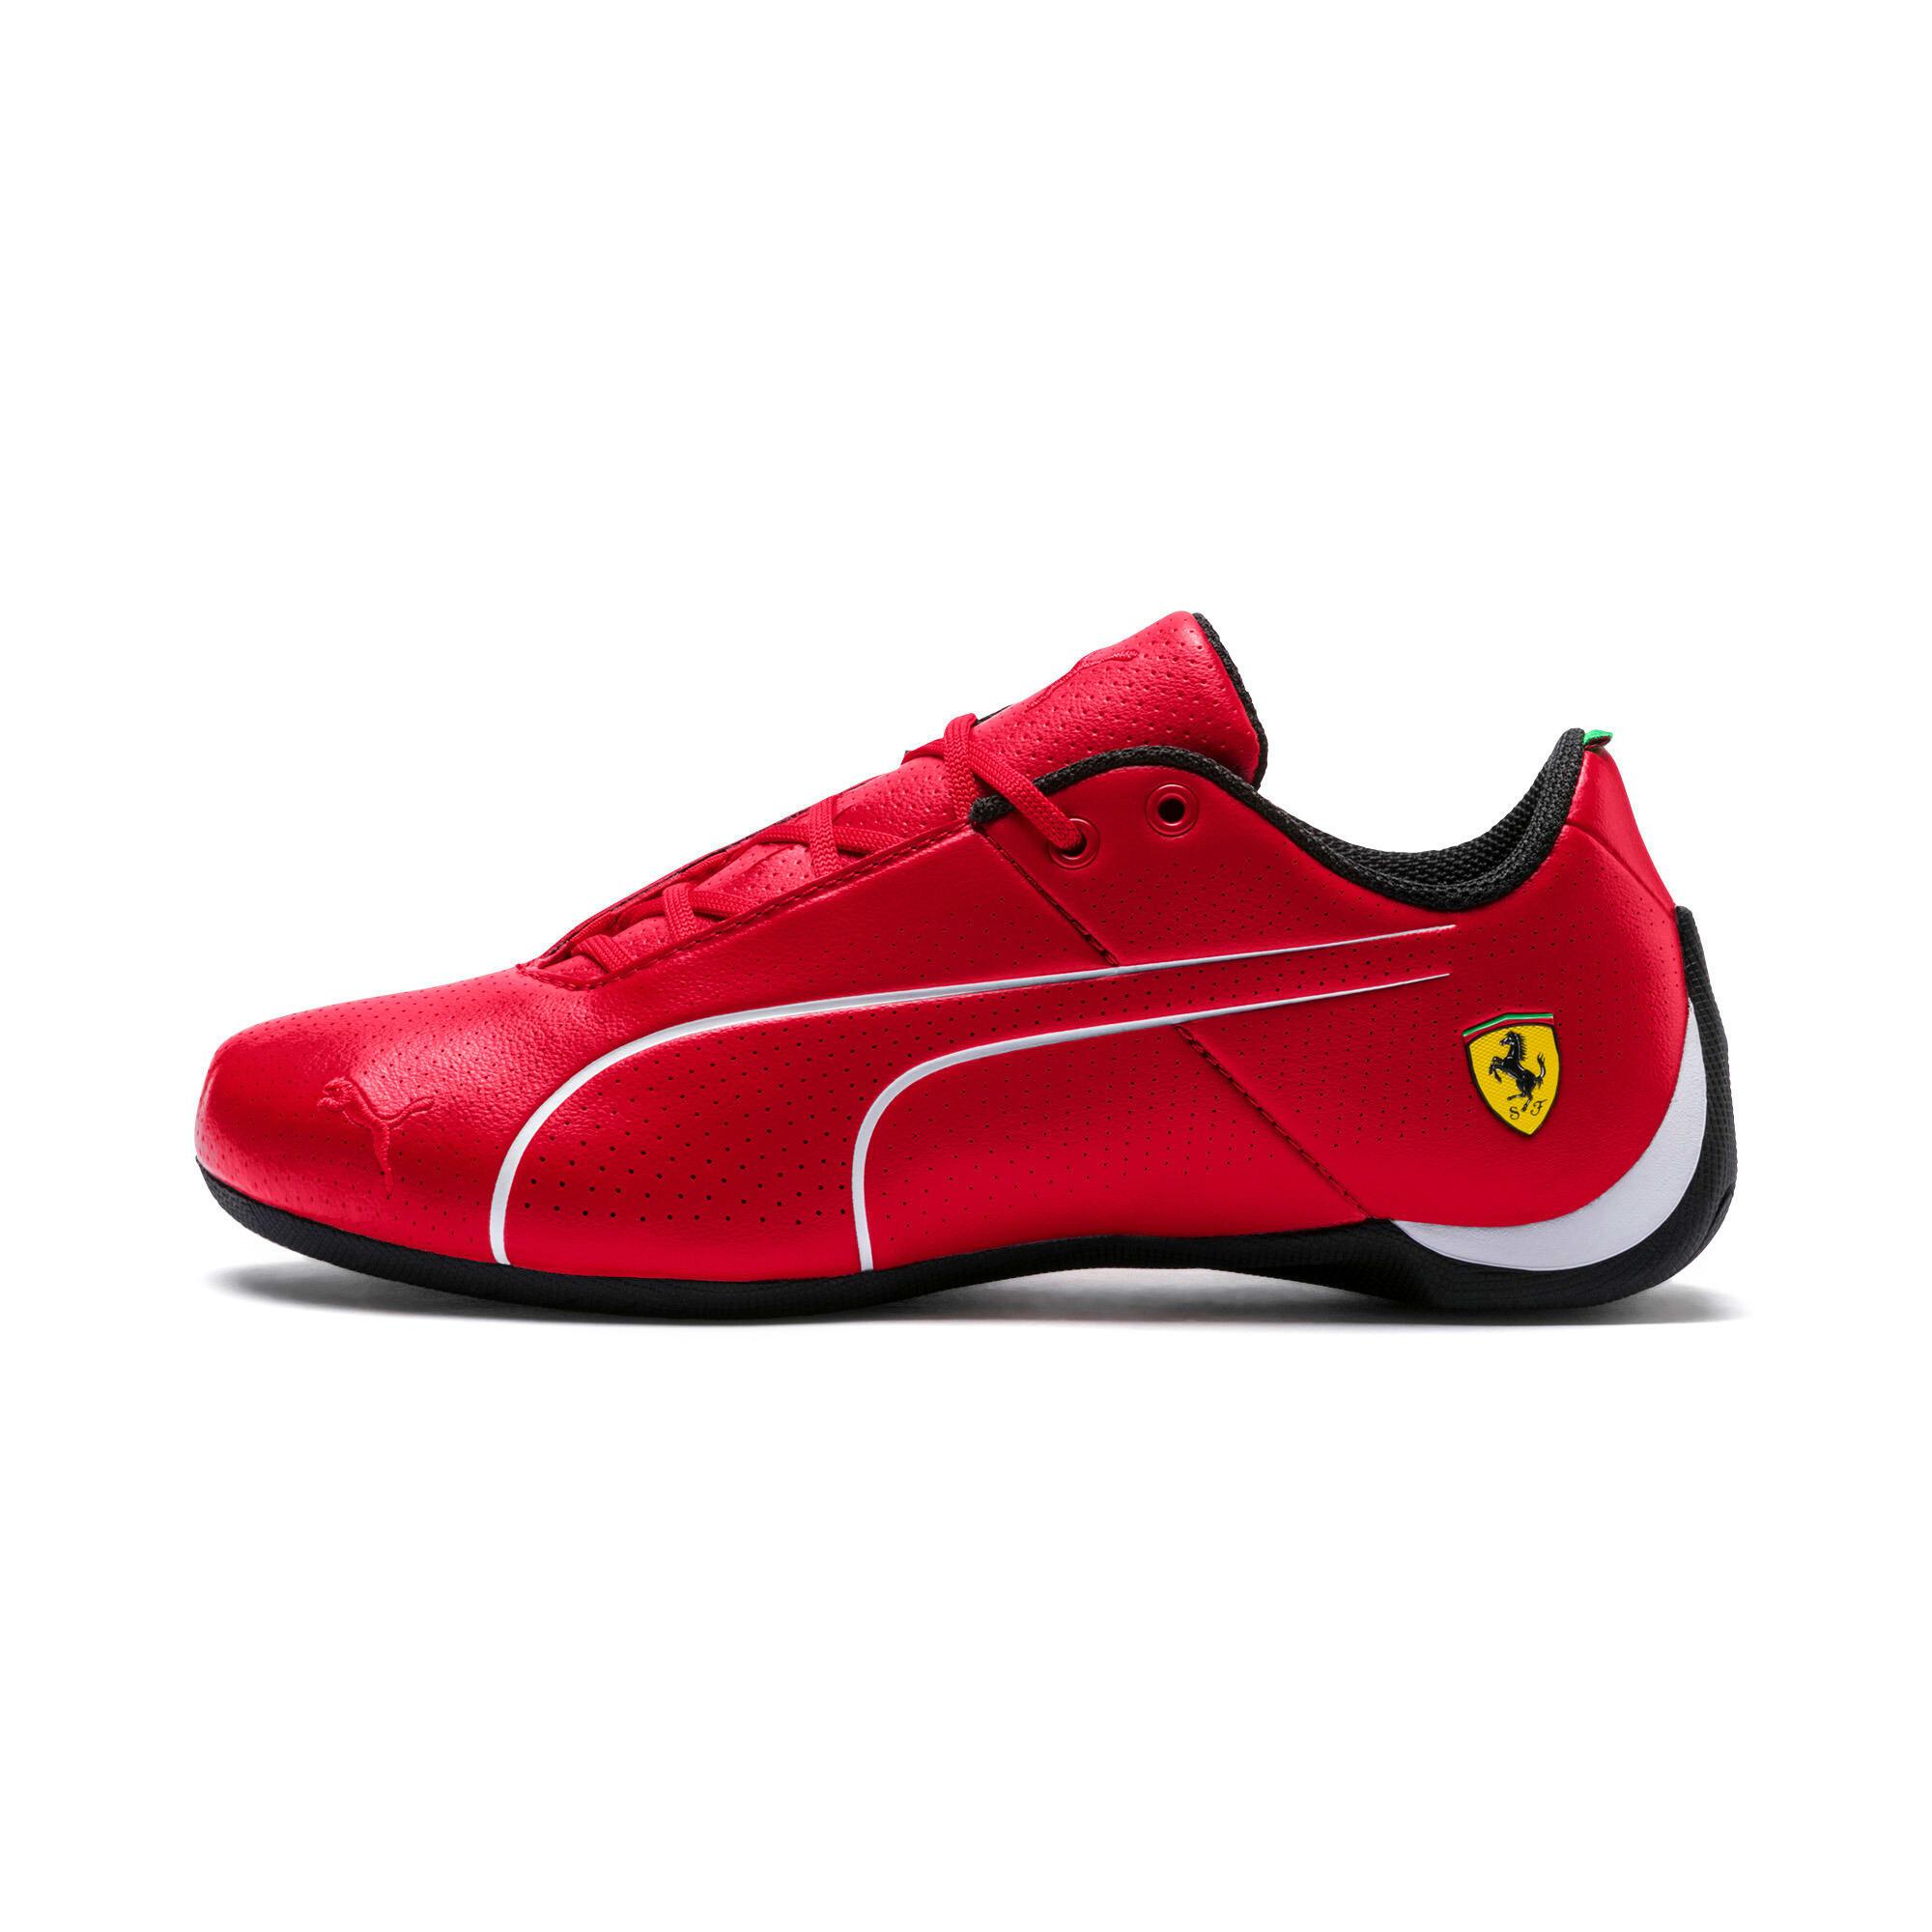 Thumbnail 1 of Scuderia Ferrari Future Cat Ultra Shoes JR, Rosso Corsa-Puma White, medium